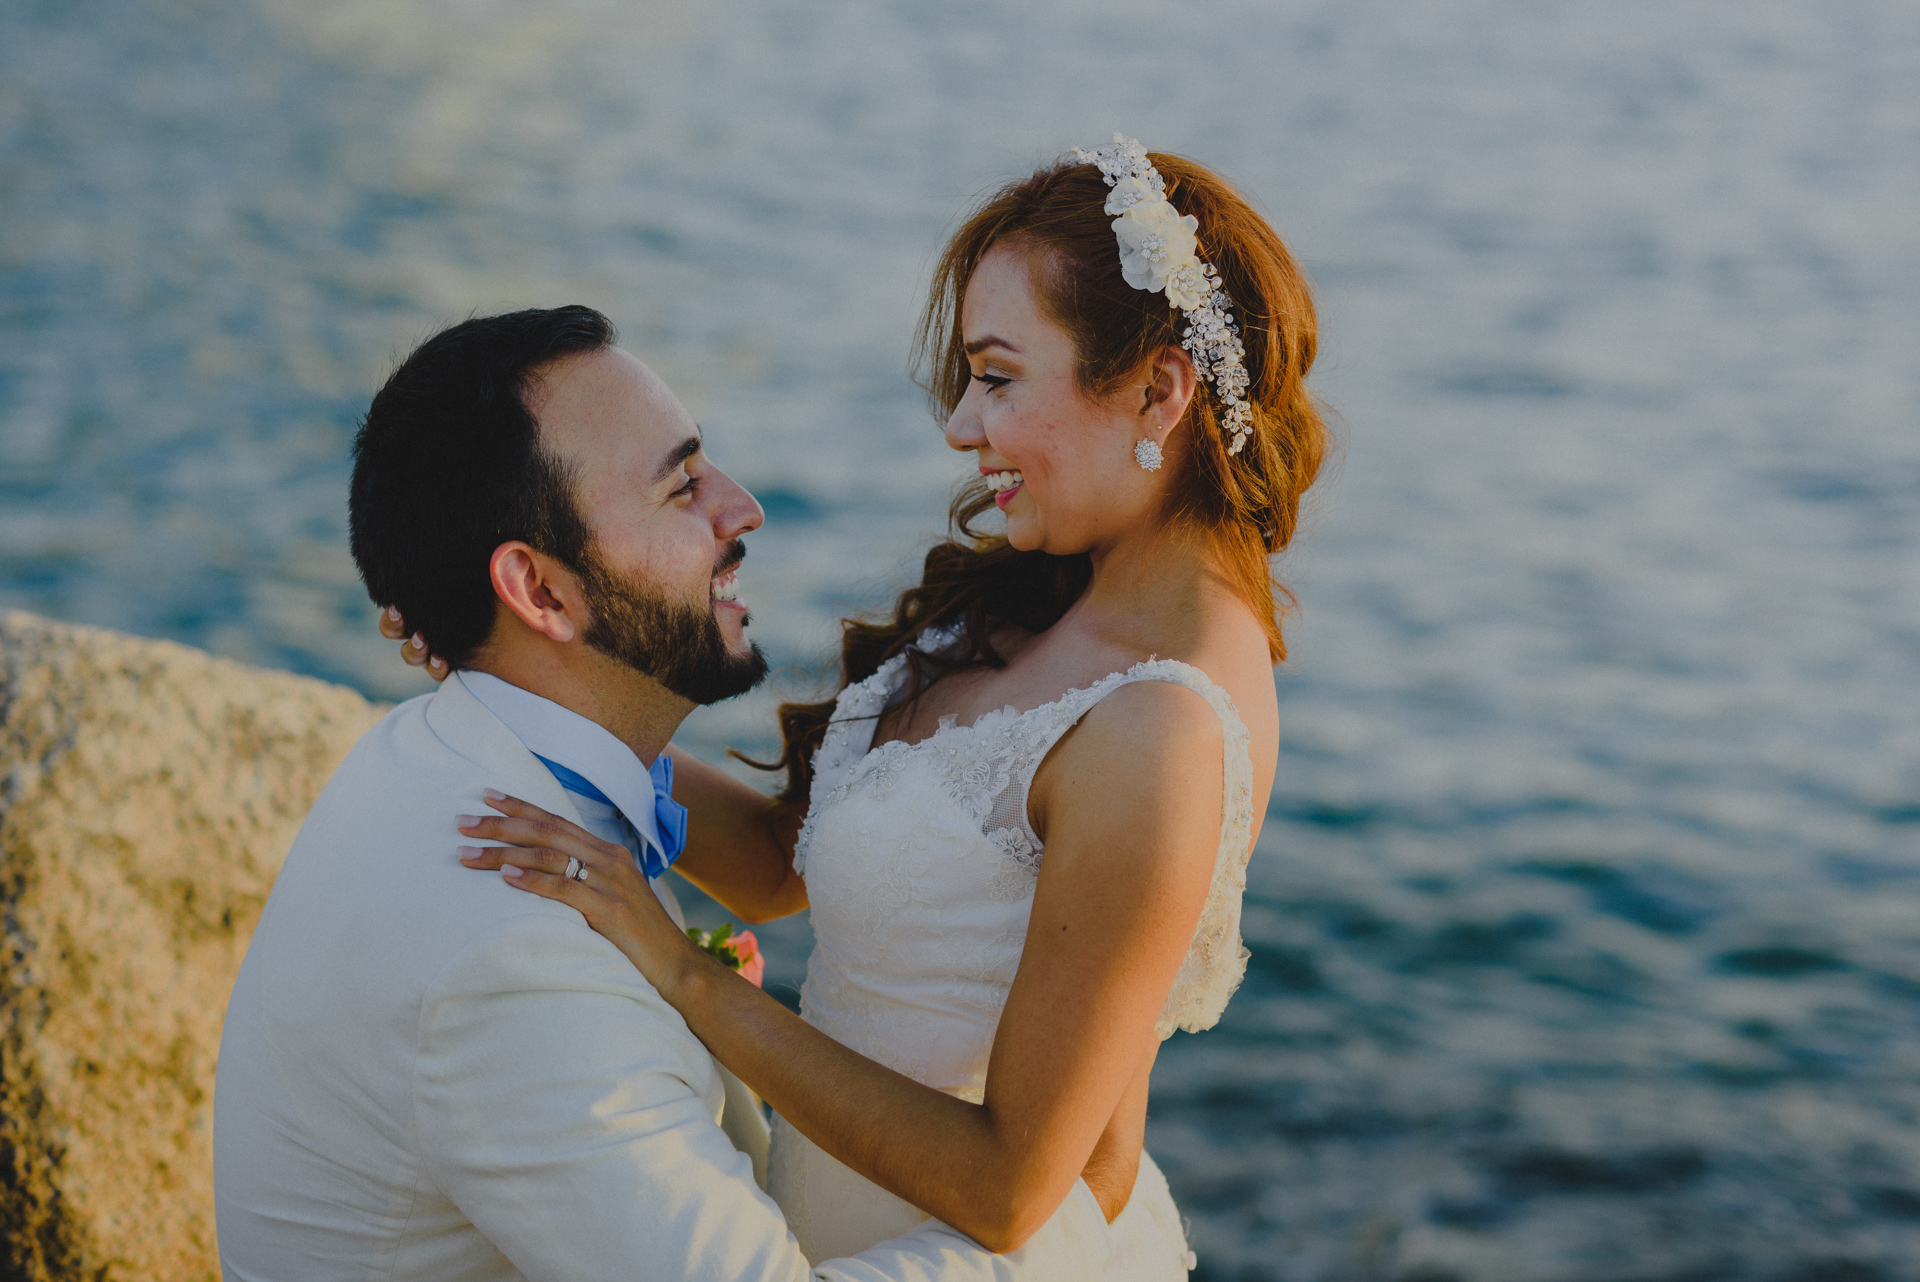 Wedding N&M BLOG luishoudin.com (88 de 174)